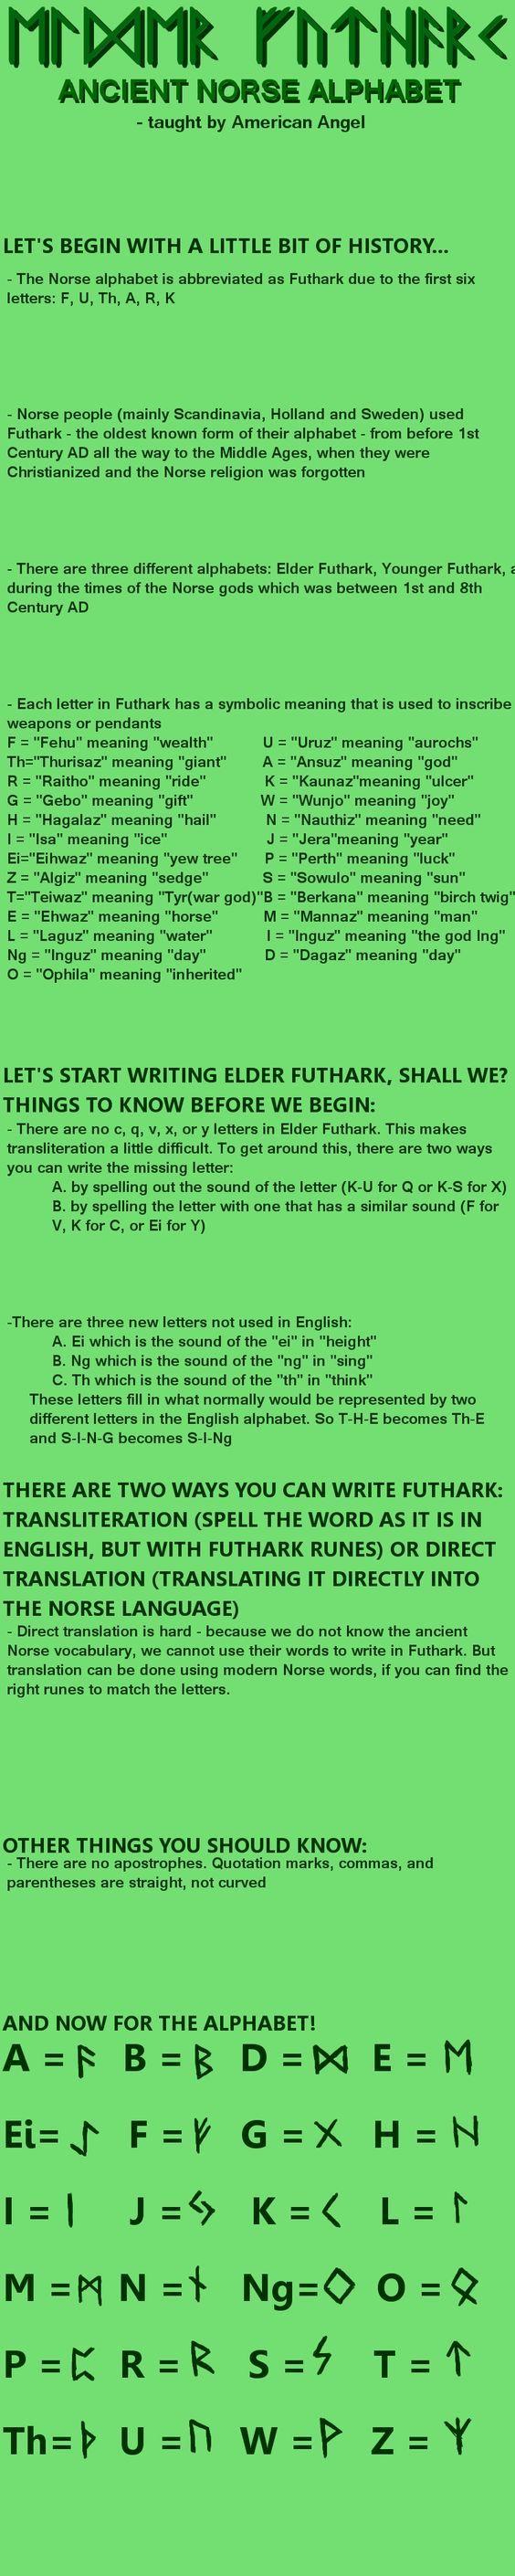 Best 25 norse alphabet ideas only on pinterest viking for Everett tattoo emporium